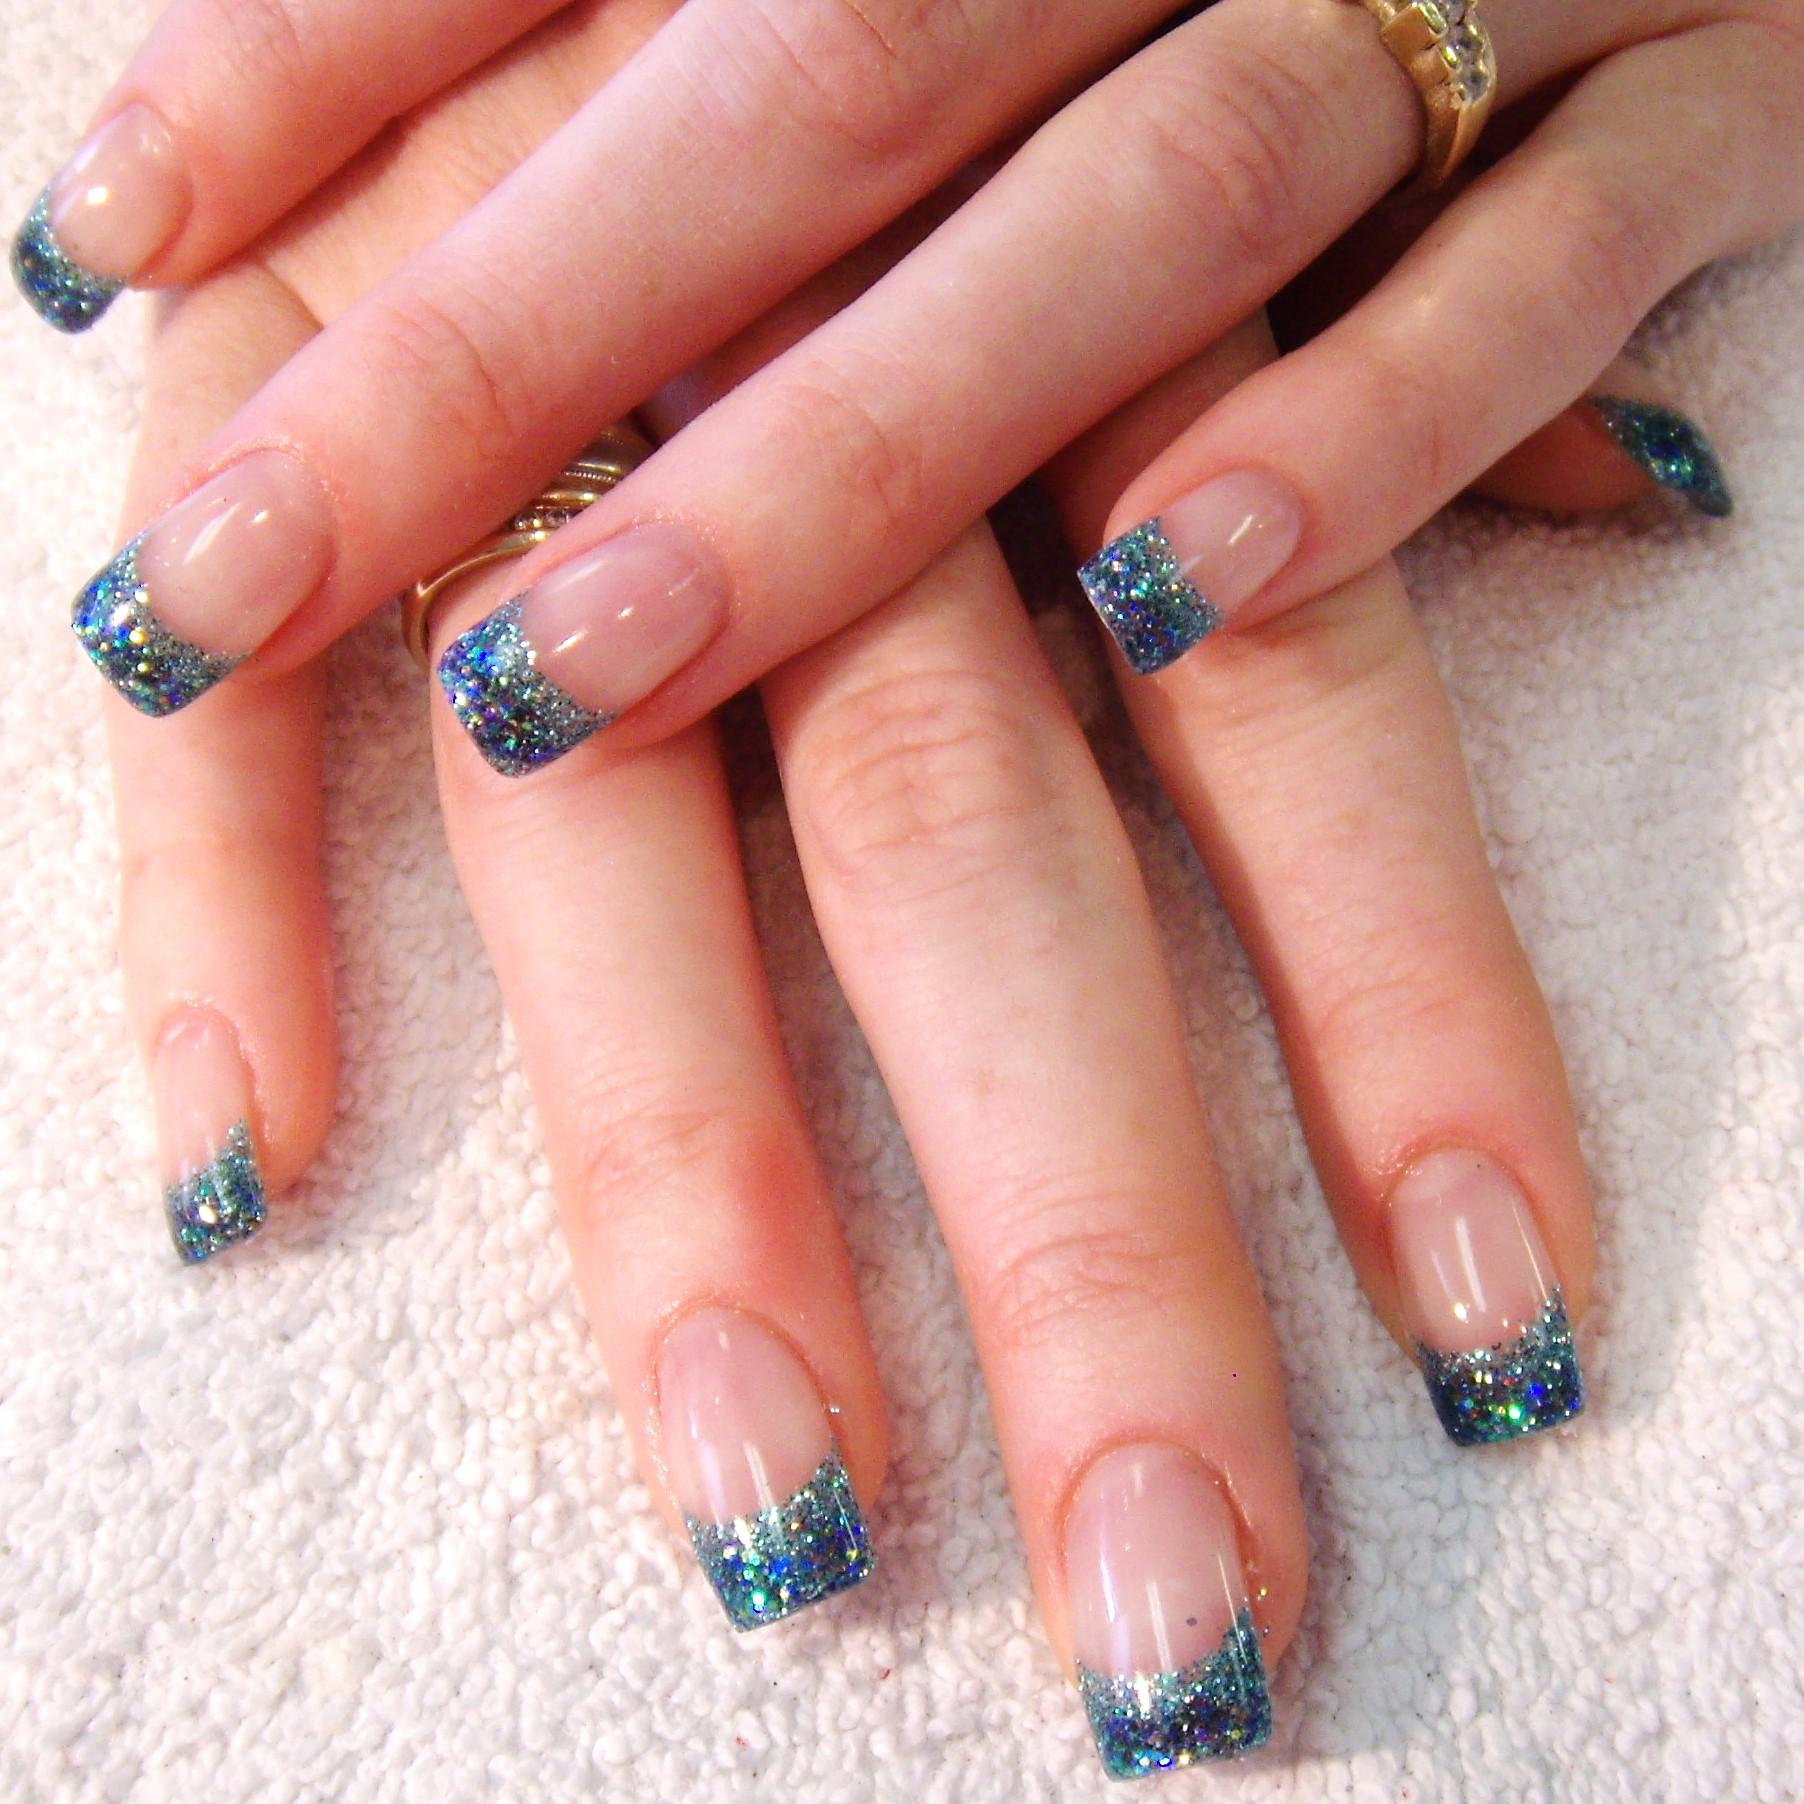 gel nail designs for short nails photo - 2 - Gel Nail Designs For Short Nails - Expression Nails